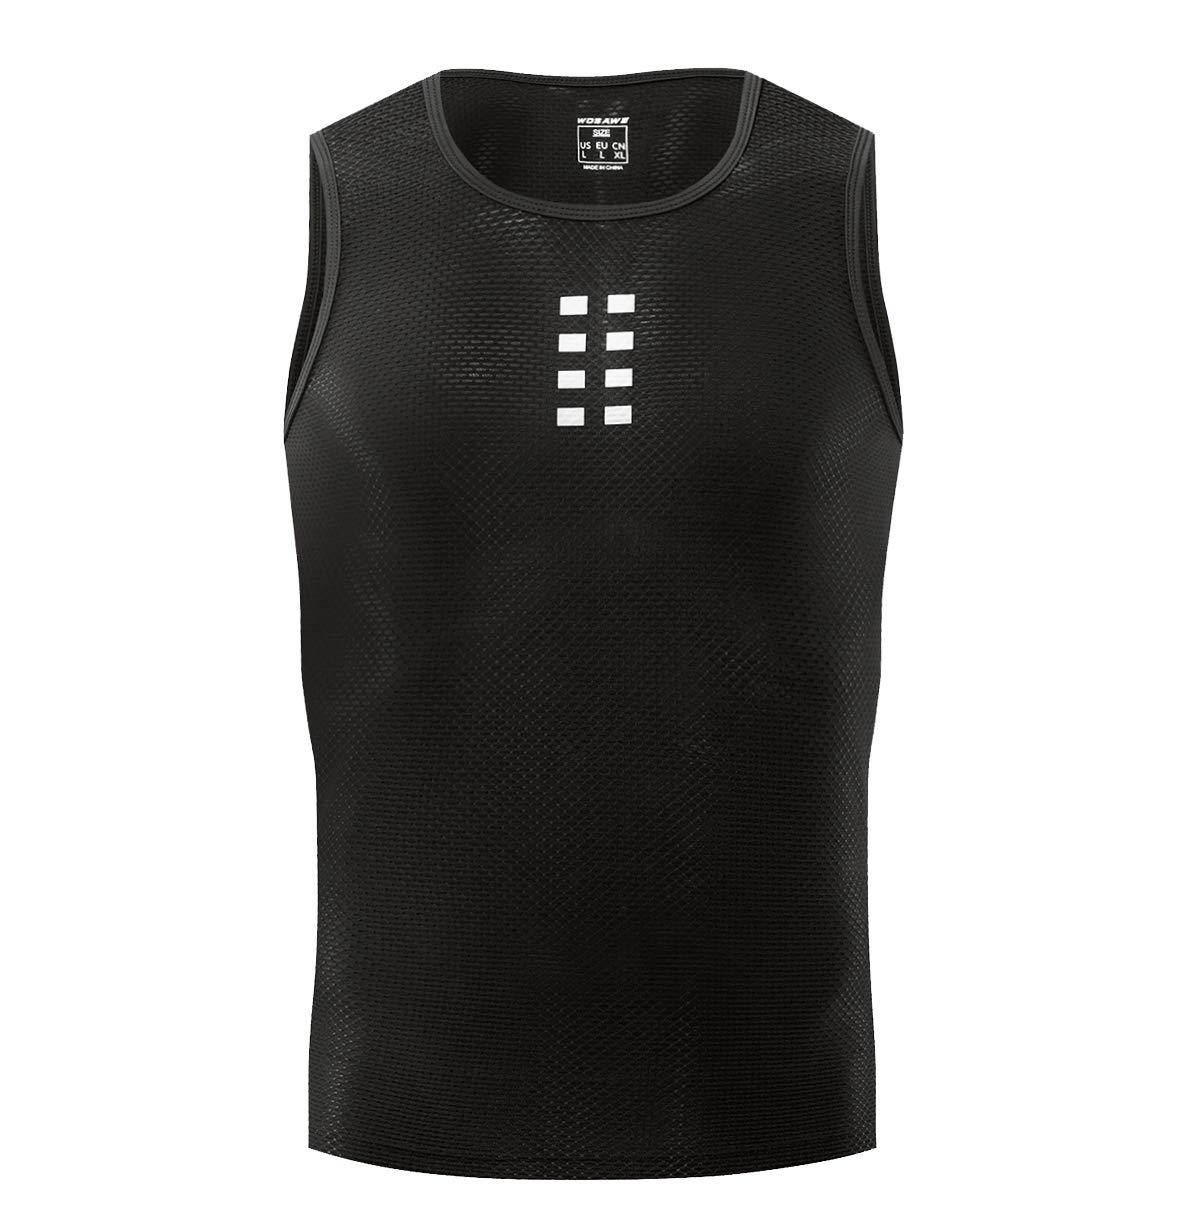 WOSAWE Men's Cycling Base Layer Sleeveless Bike Undershirt Cool Mesh Bicycle Top Vest